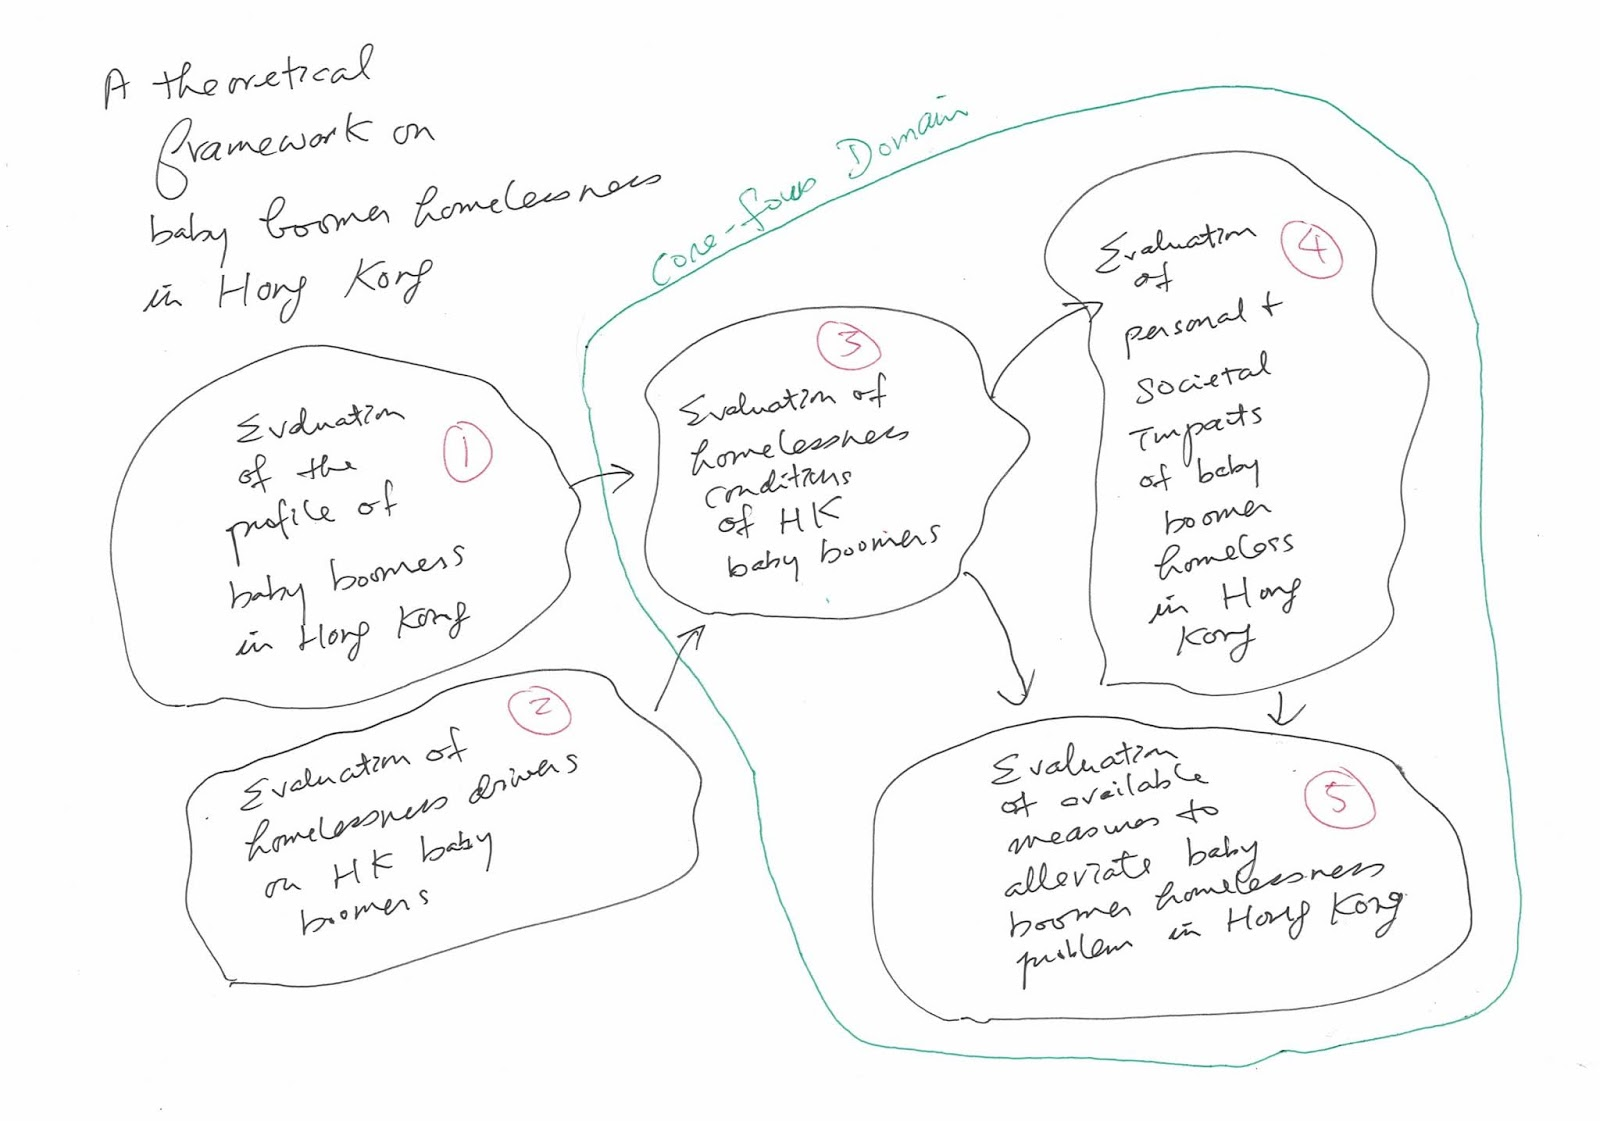 diagram 2 a level 1 theoretical framework on component 3 of the theoretical framework level 0  [ 1600 x 1121 Pixel ]